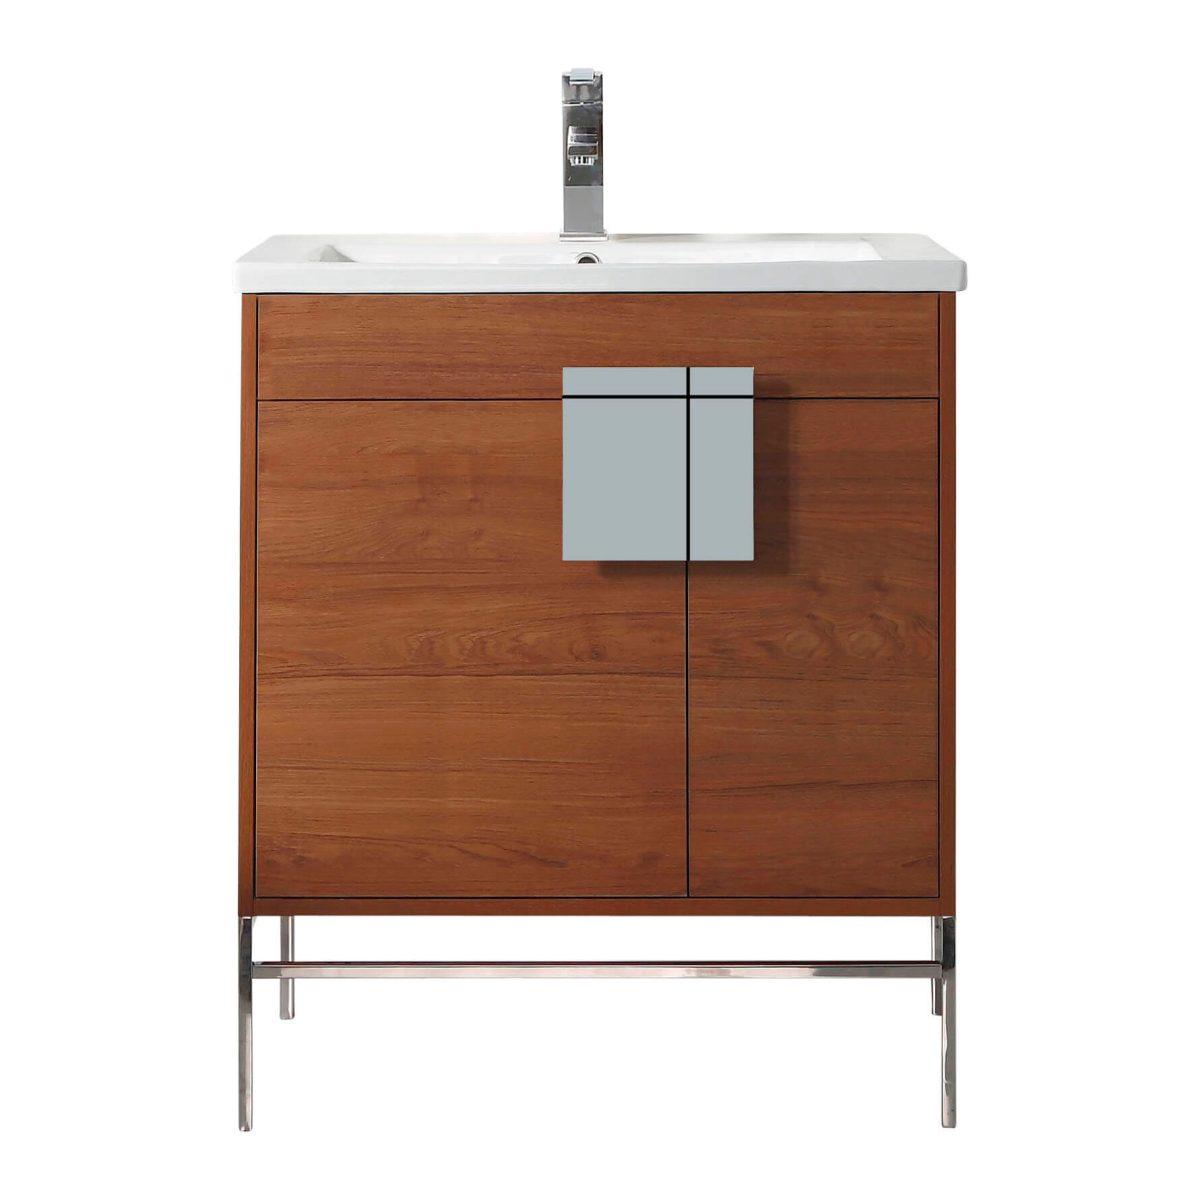 "Shawbridge 30"" Modern Bathroom Vanity  Spicy Walnut with Chrome Hardware"